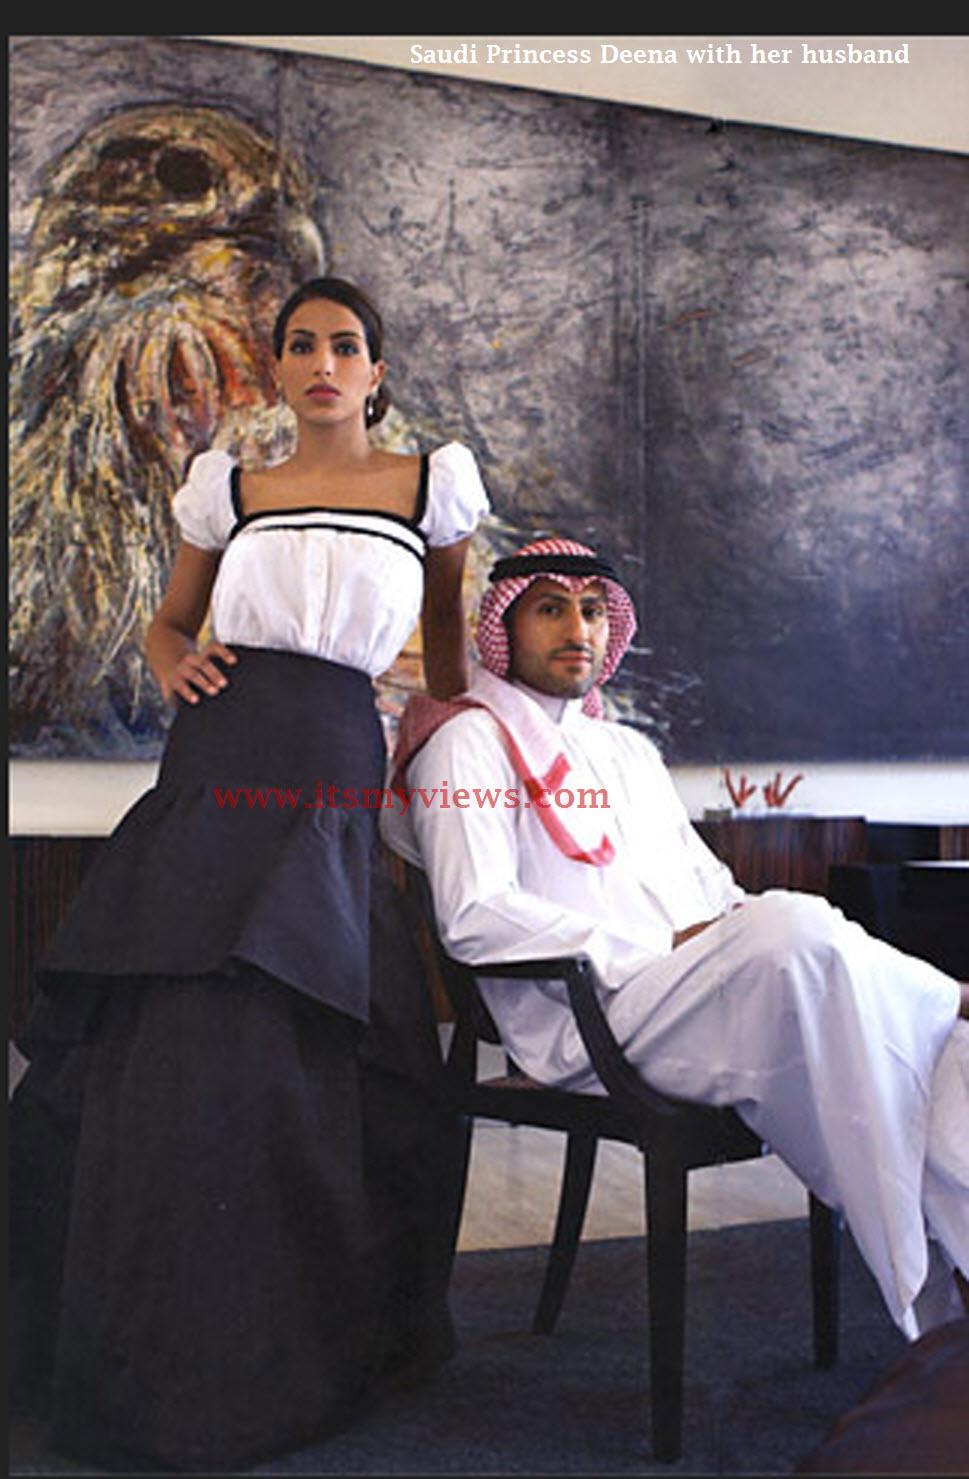 Saudi-Princess-Deena-with-her-husband.jpg